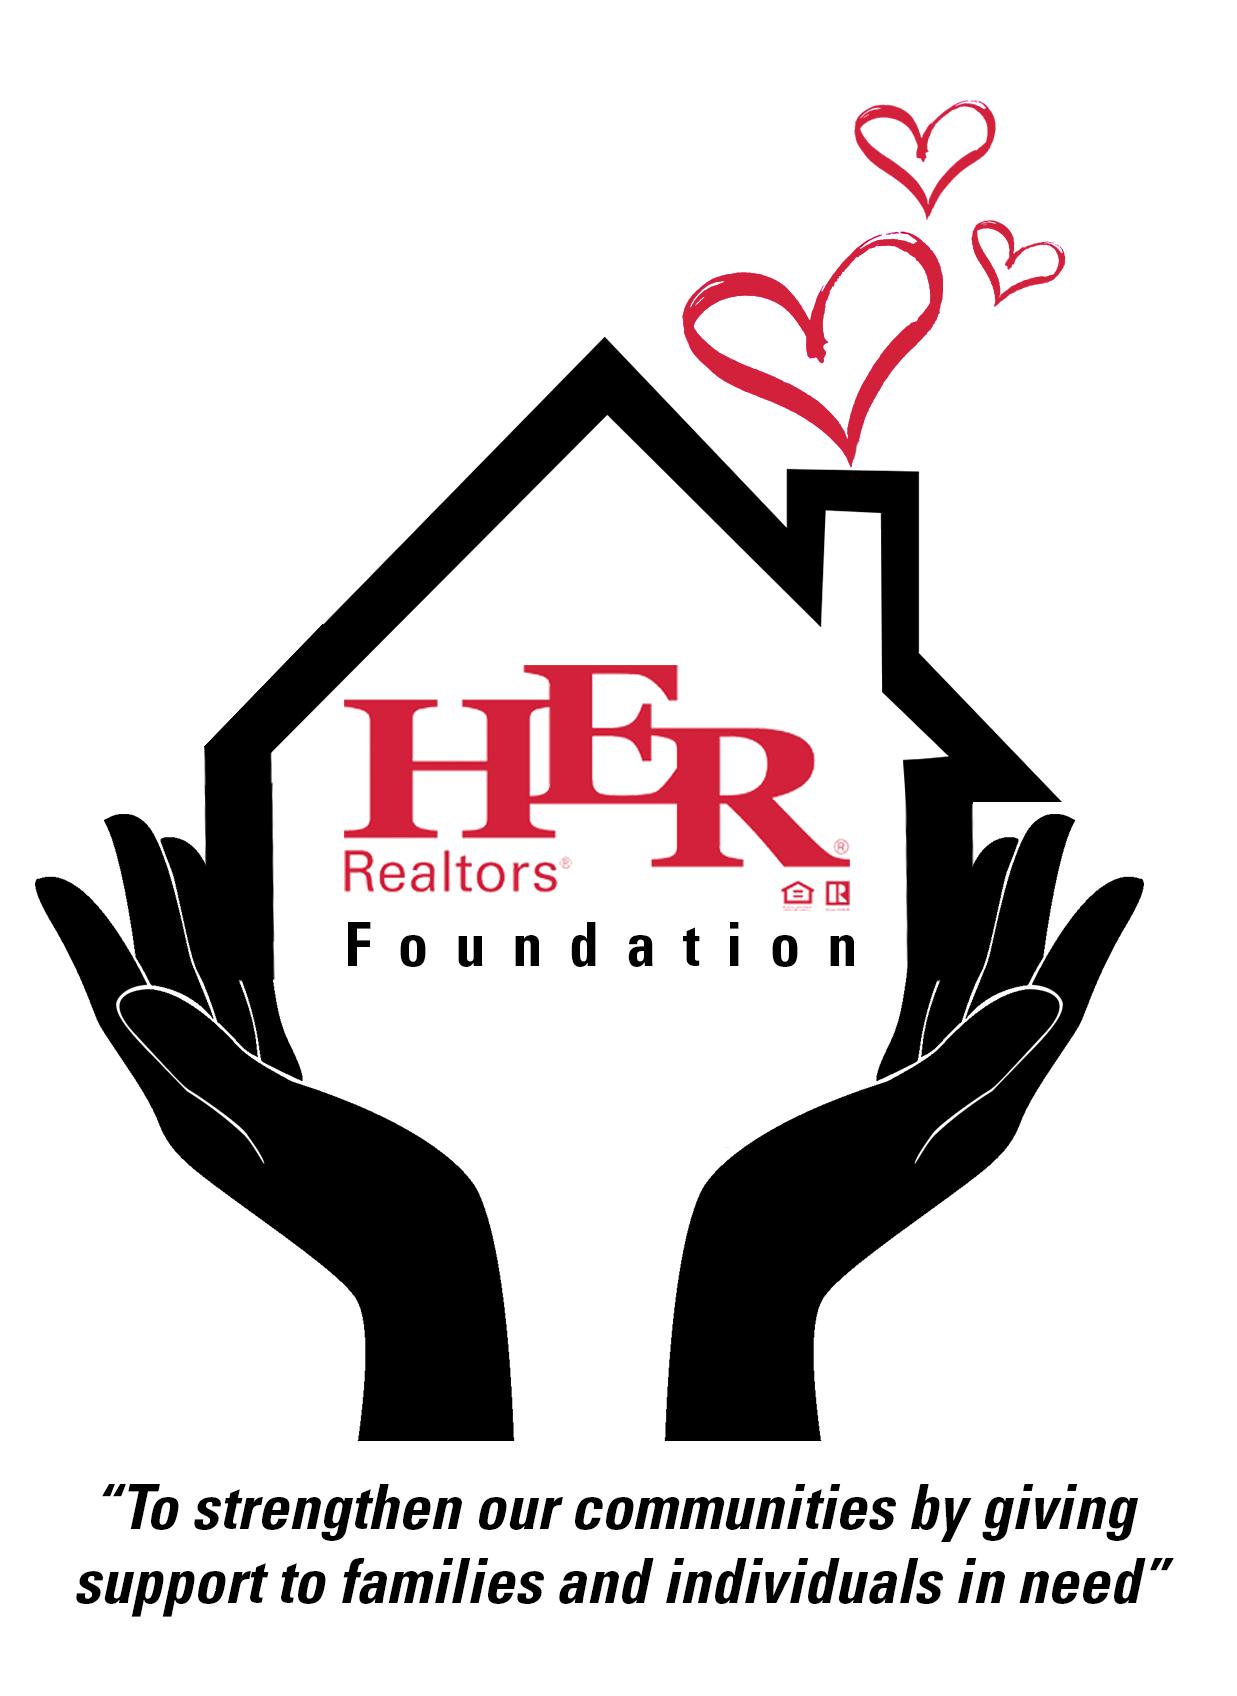 HER realtors foundation